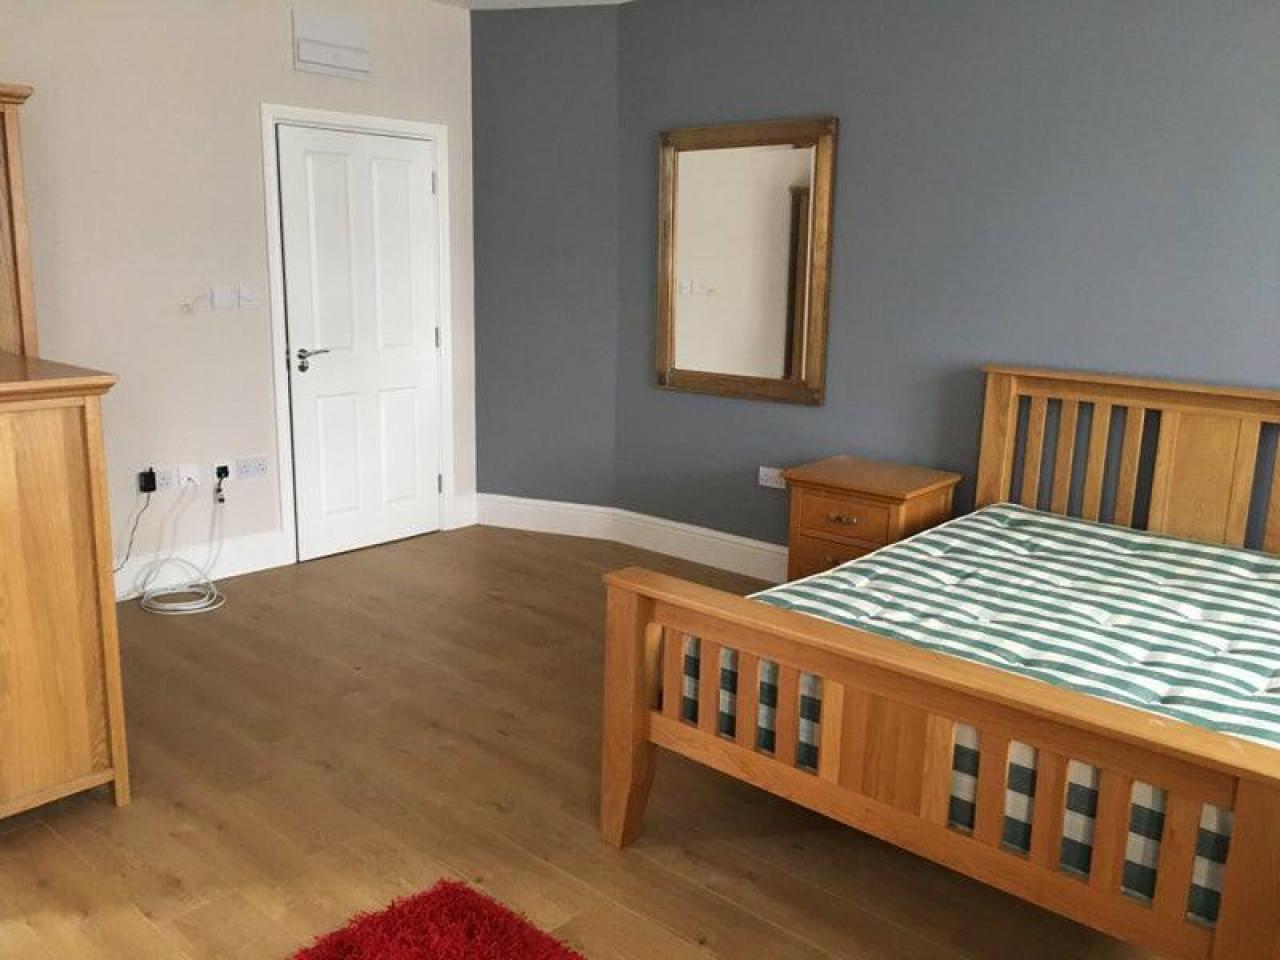 Double room NW10 - 5